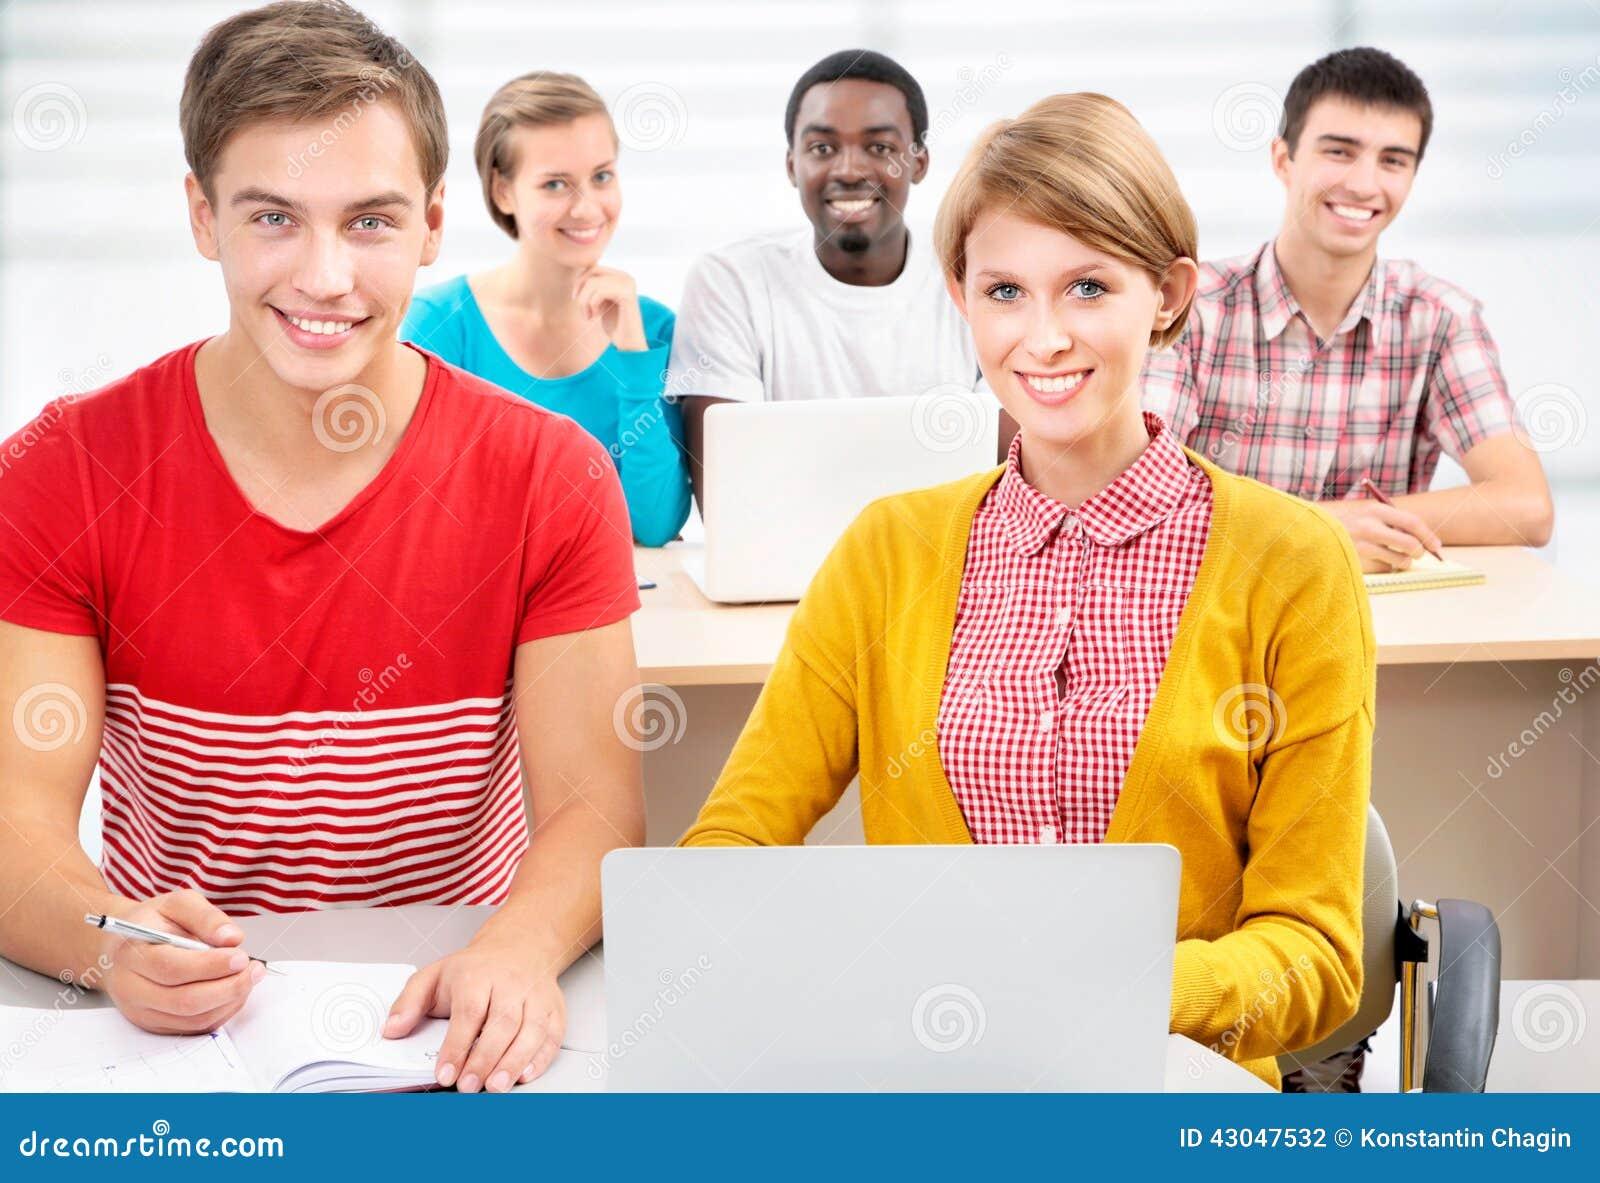 Groep jonge studenten